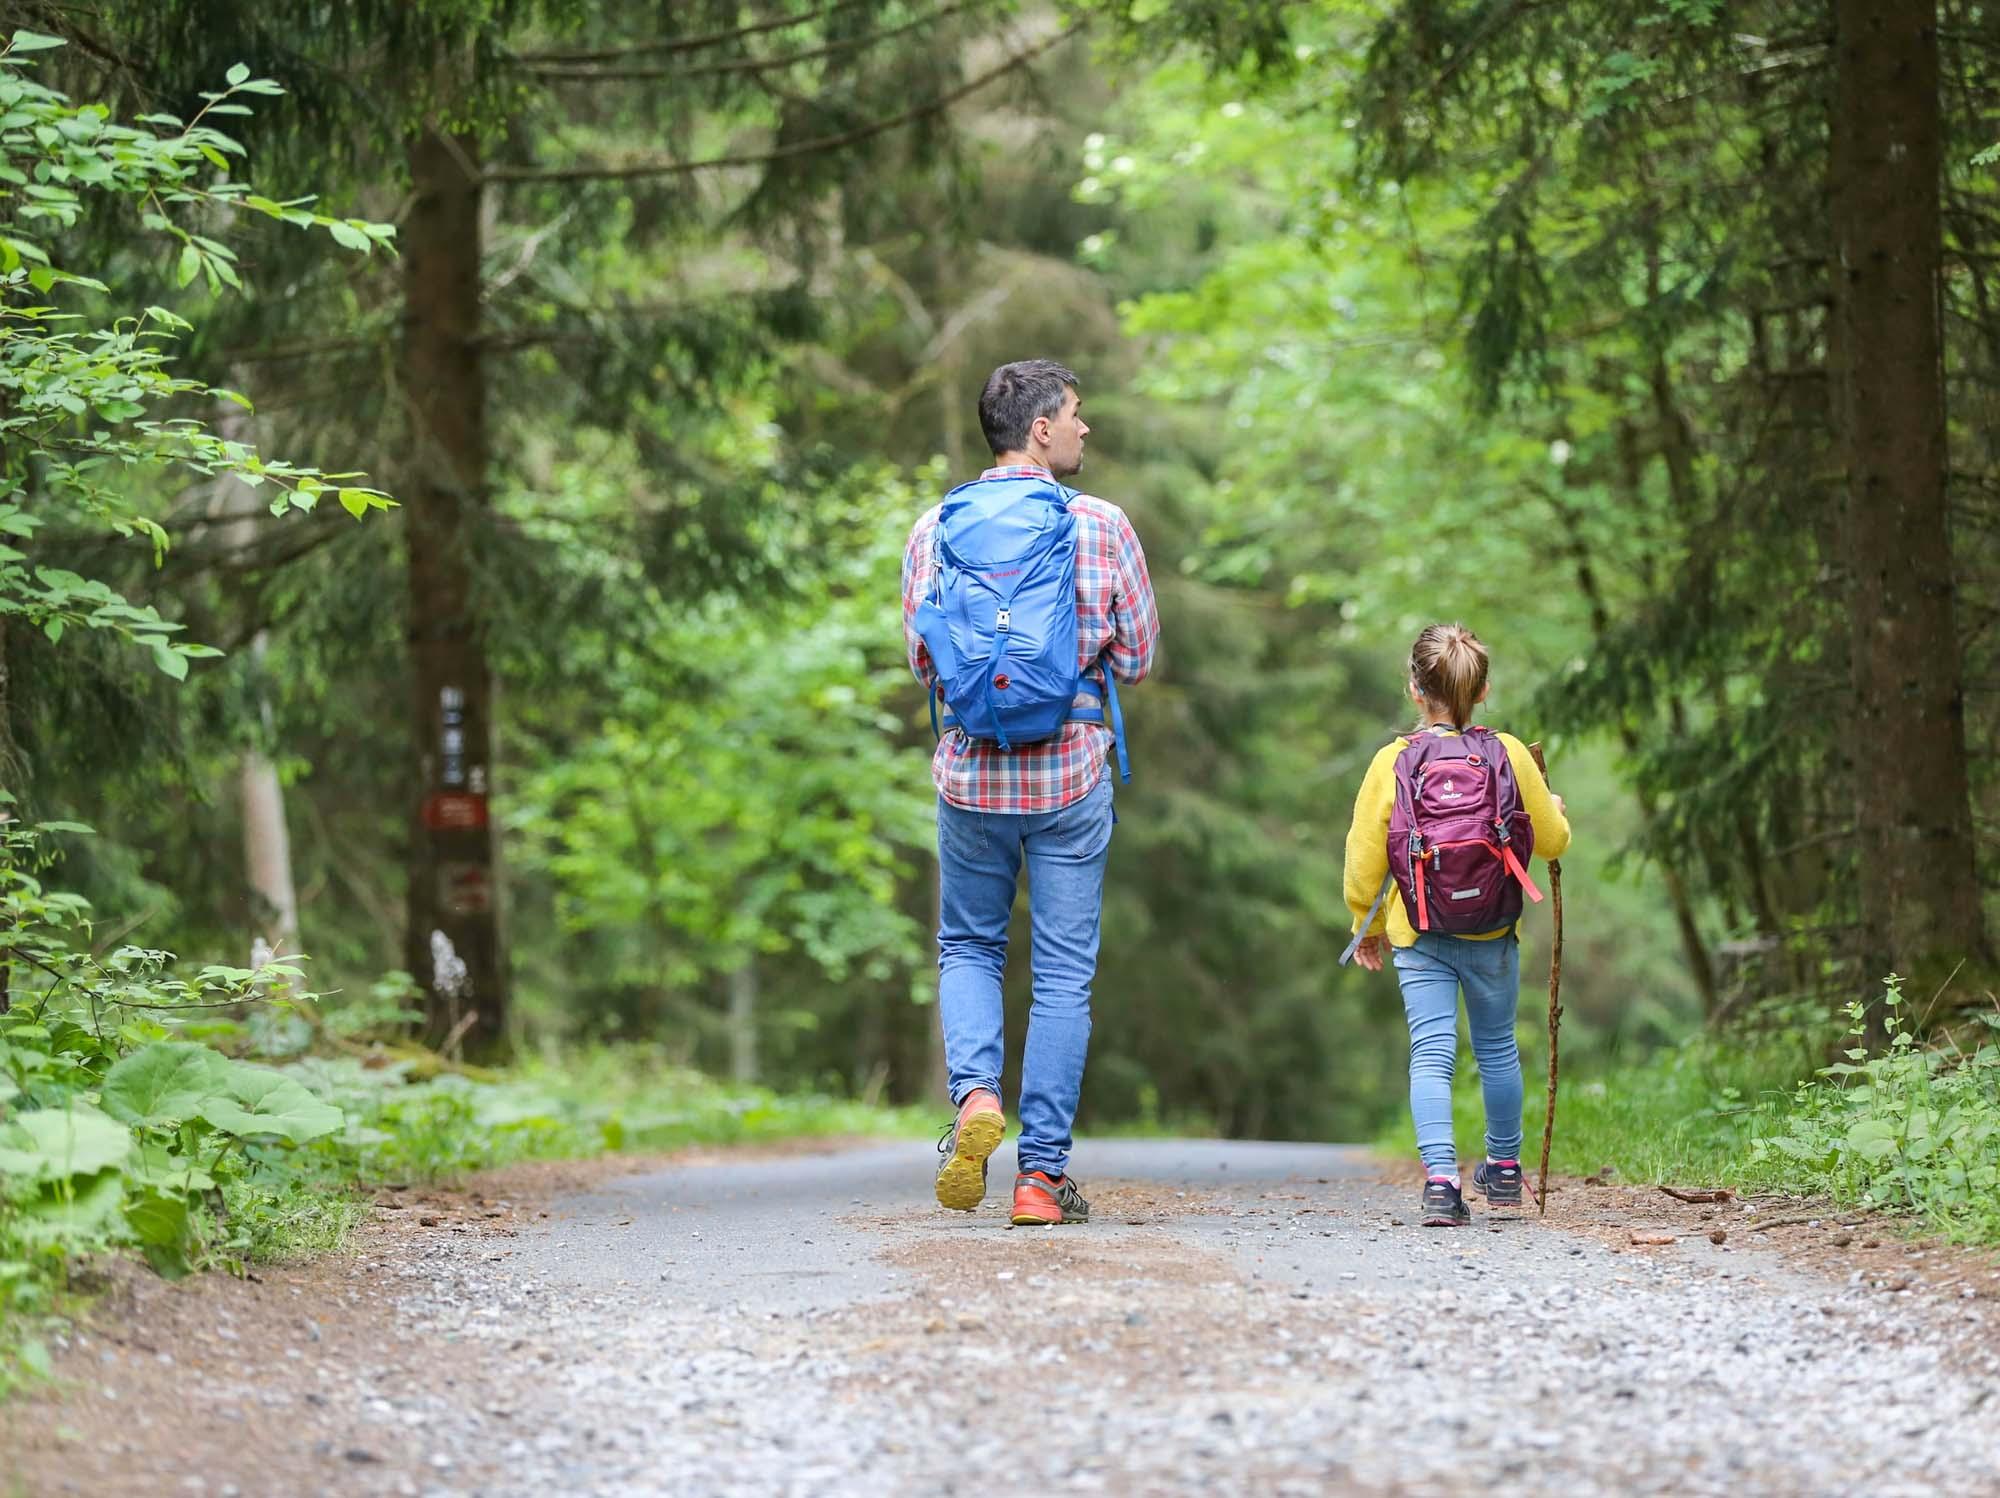 20 reasons why we homeschool